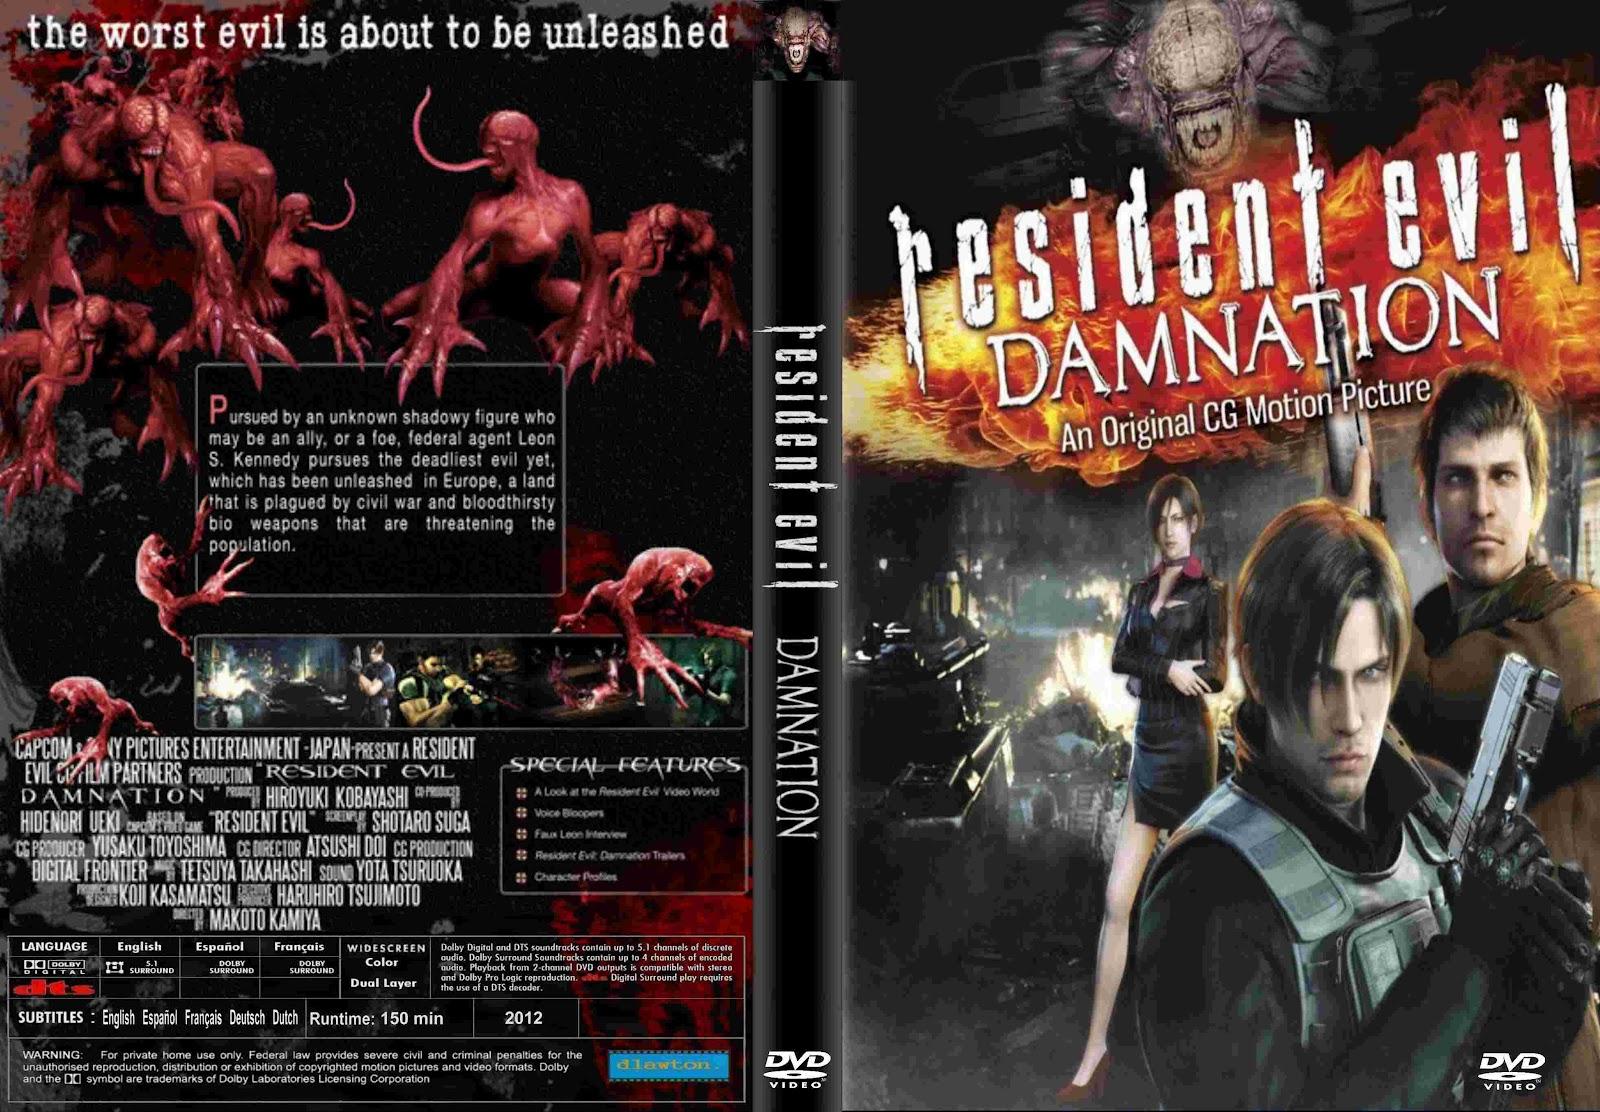 resident evil damnation movie download 480p